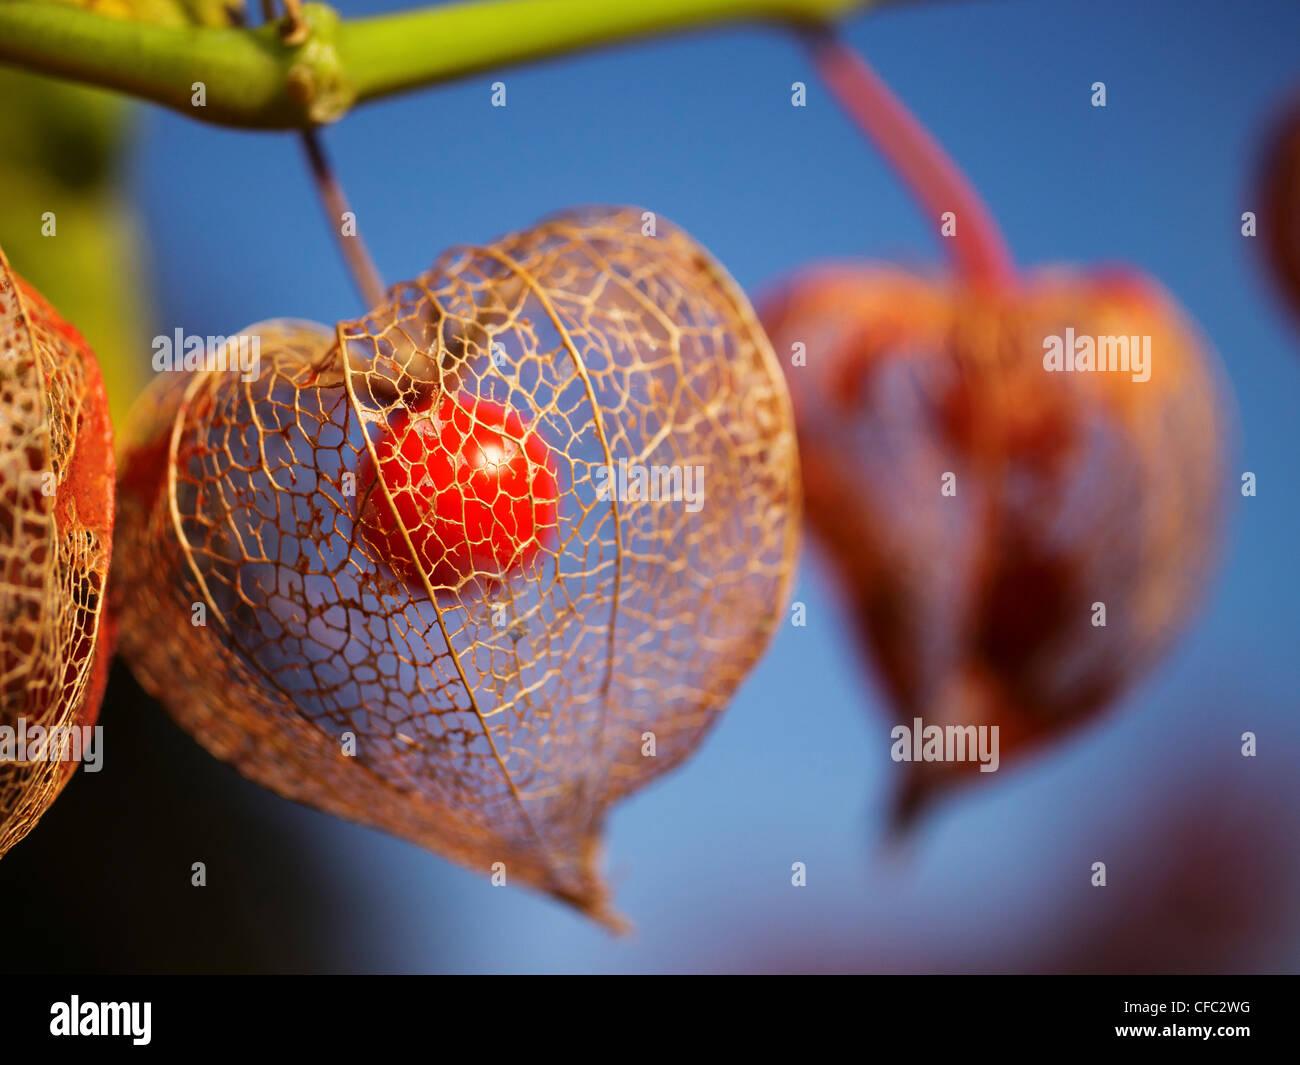 berry, vein, leaf-vein, nervure, autumn, fall, groundcherry, ground cherry, ground cherry, lampion, Chinese lantern, - Stock Image